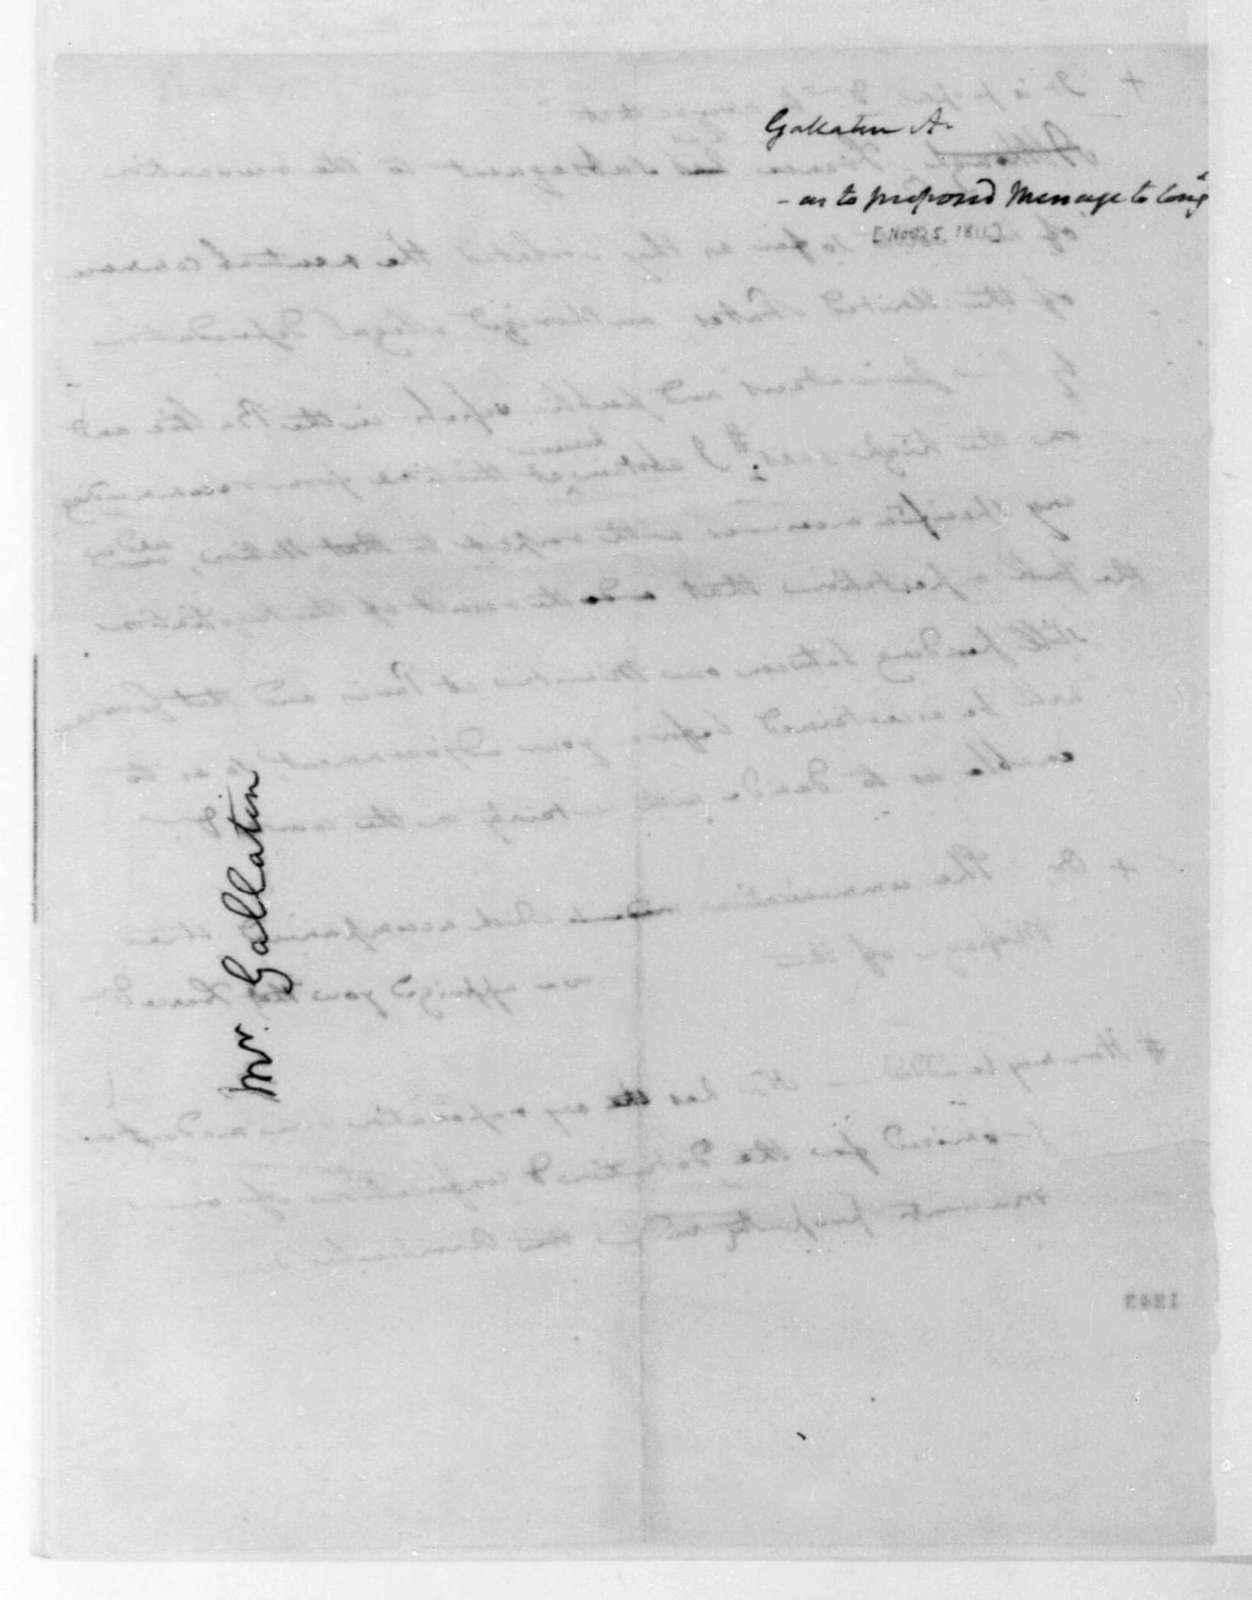 Albert Gallatin, November 5, 1811. Notes, Presidential Message.